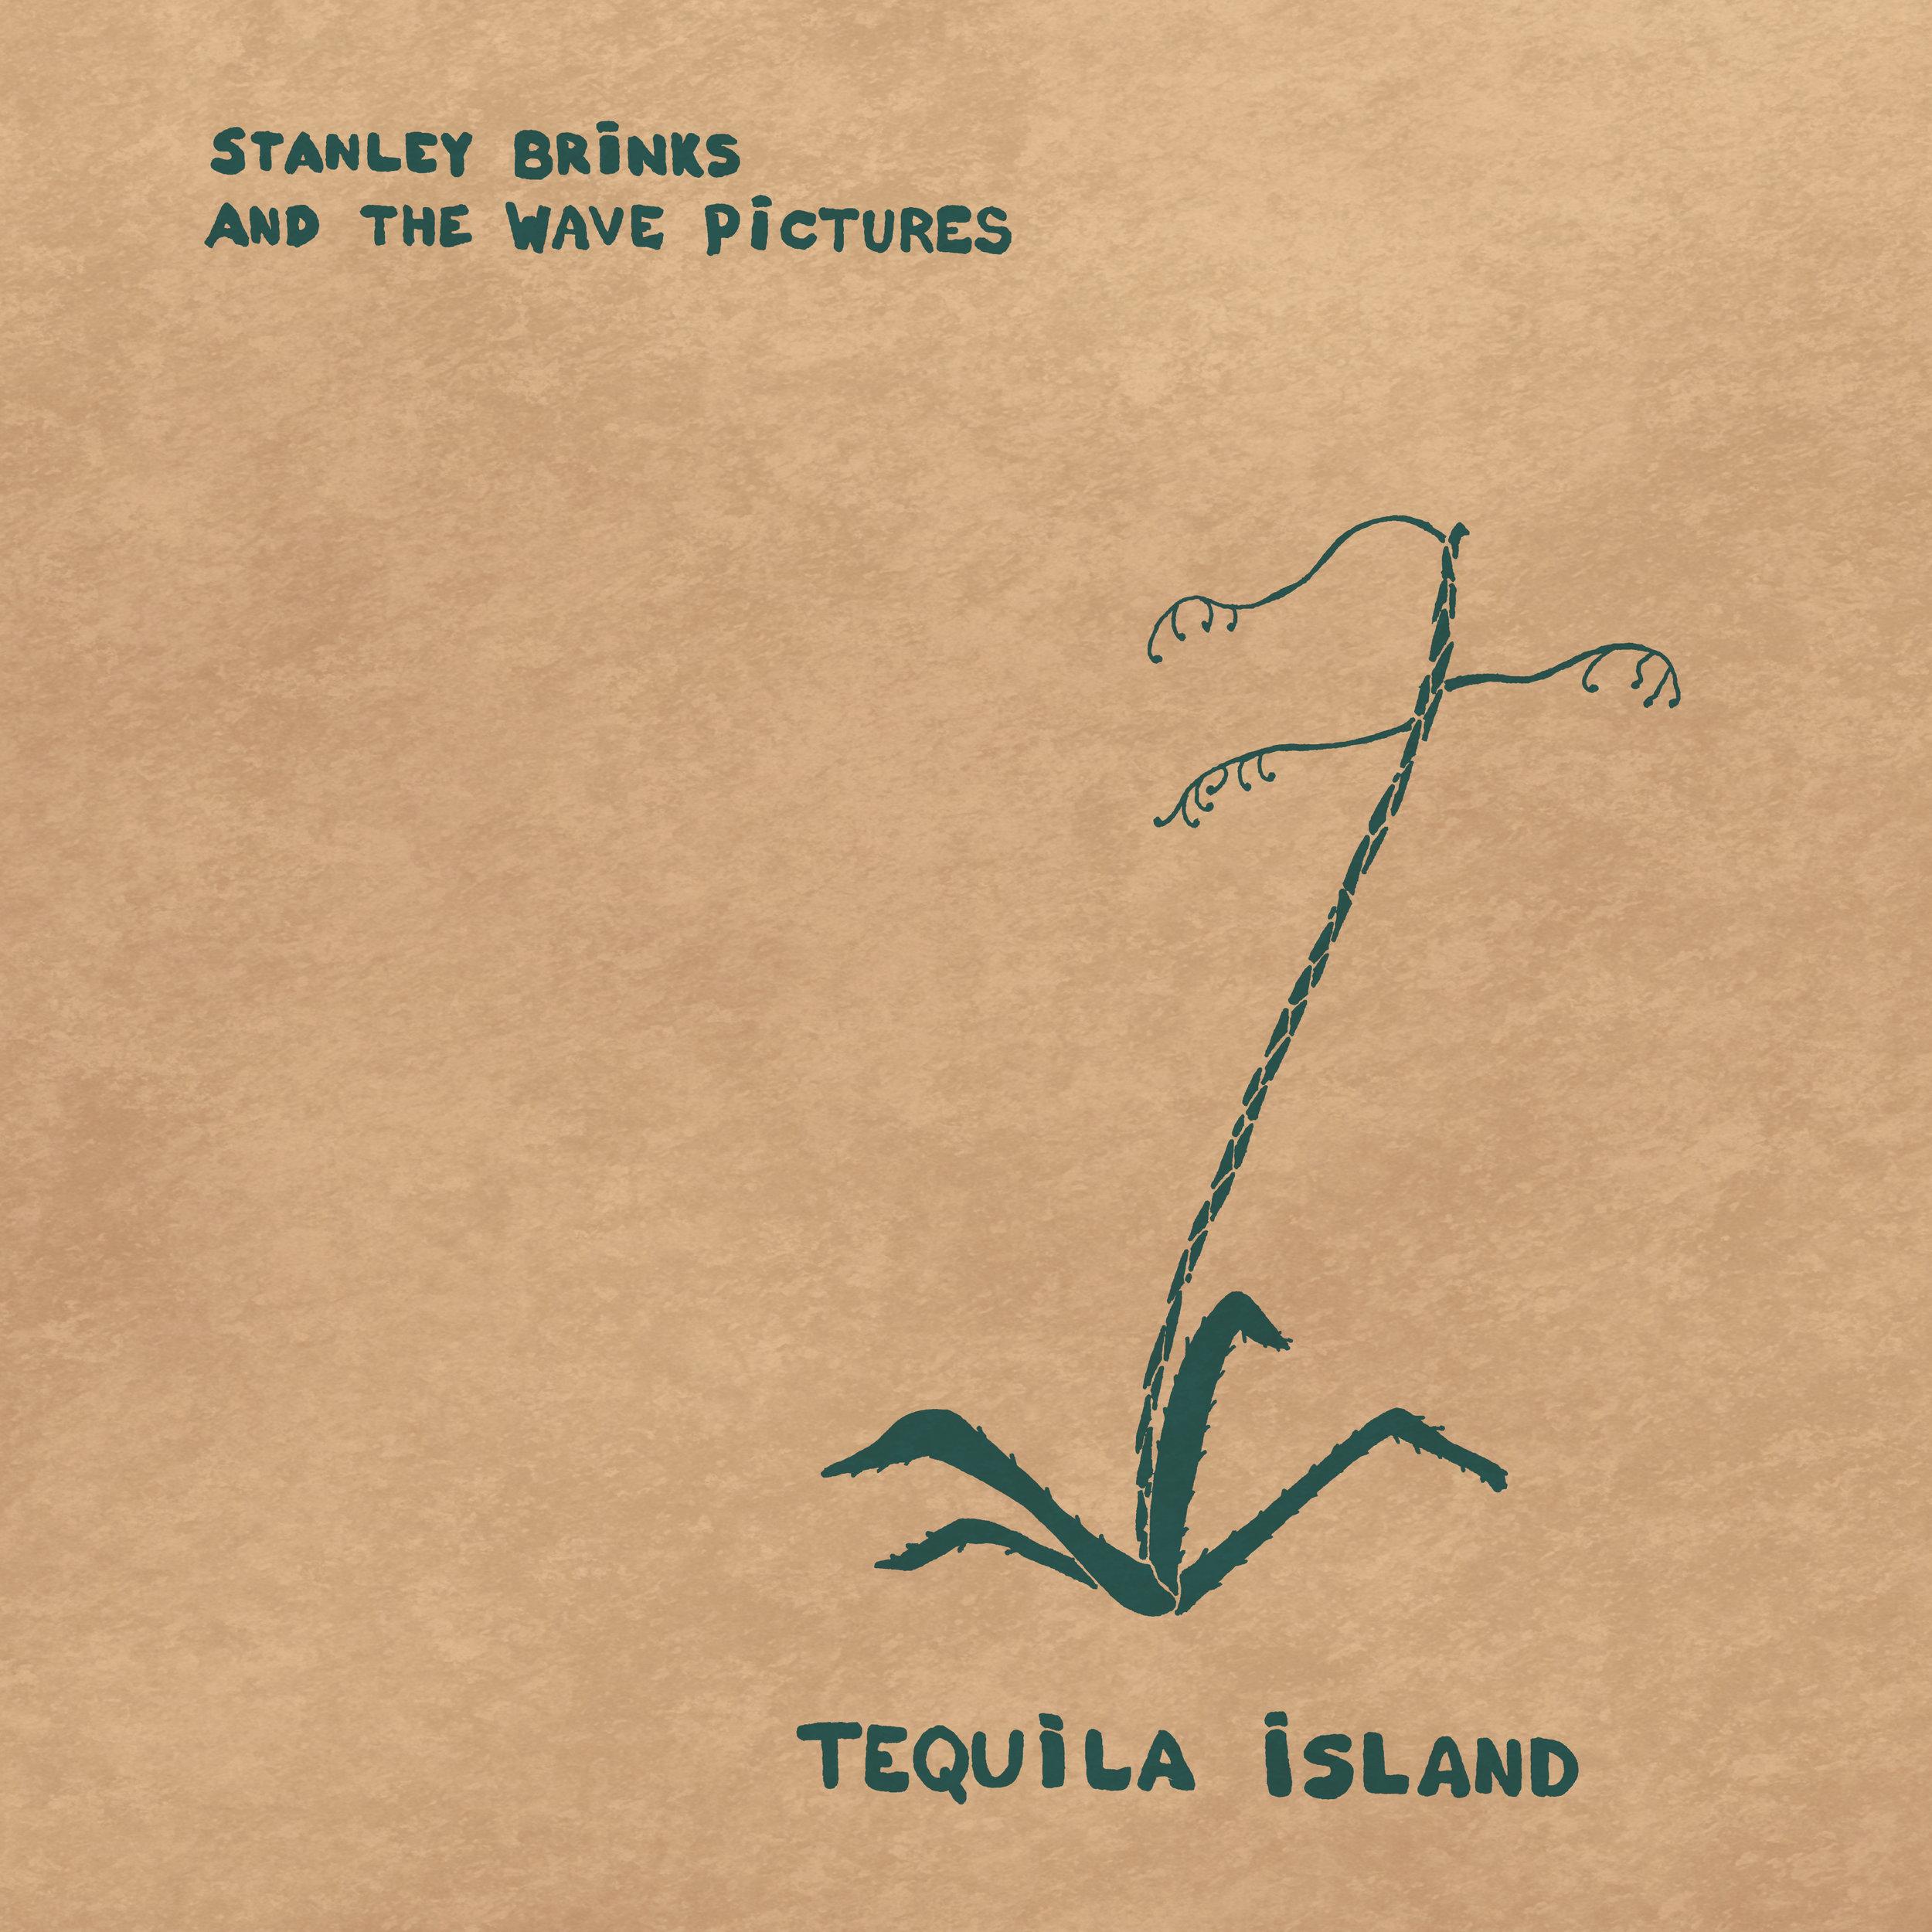 Tequila Island 4k.jpg